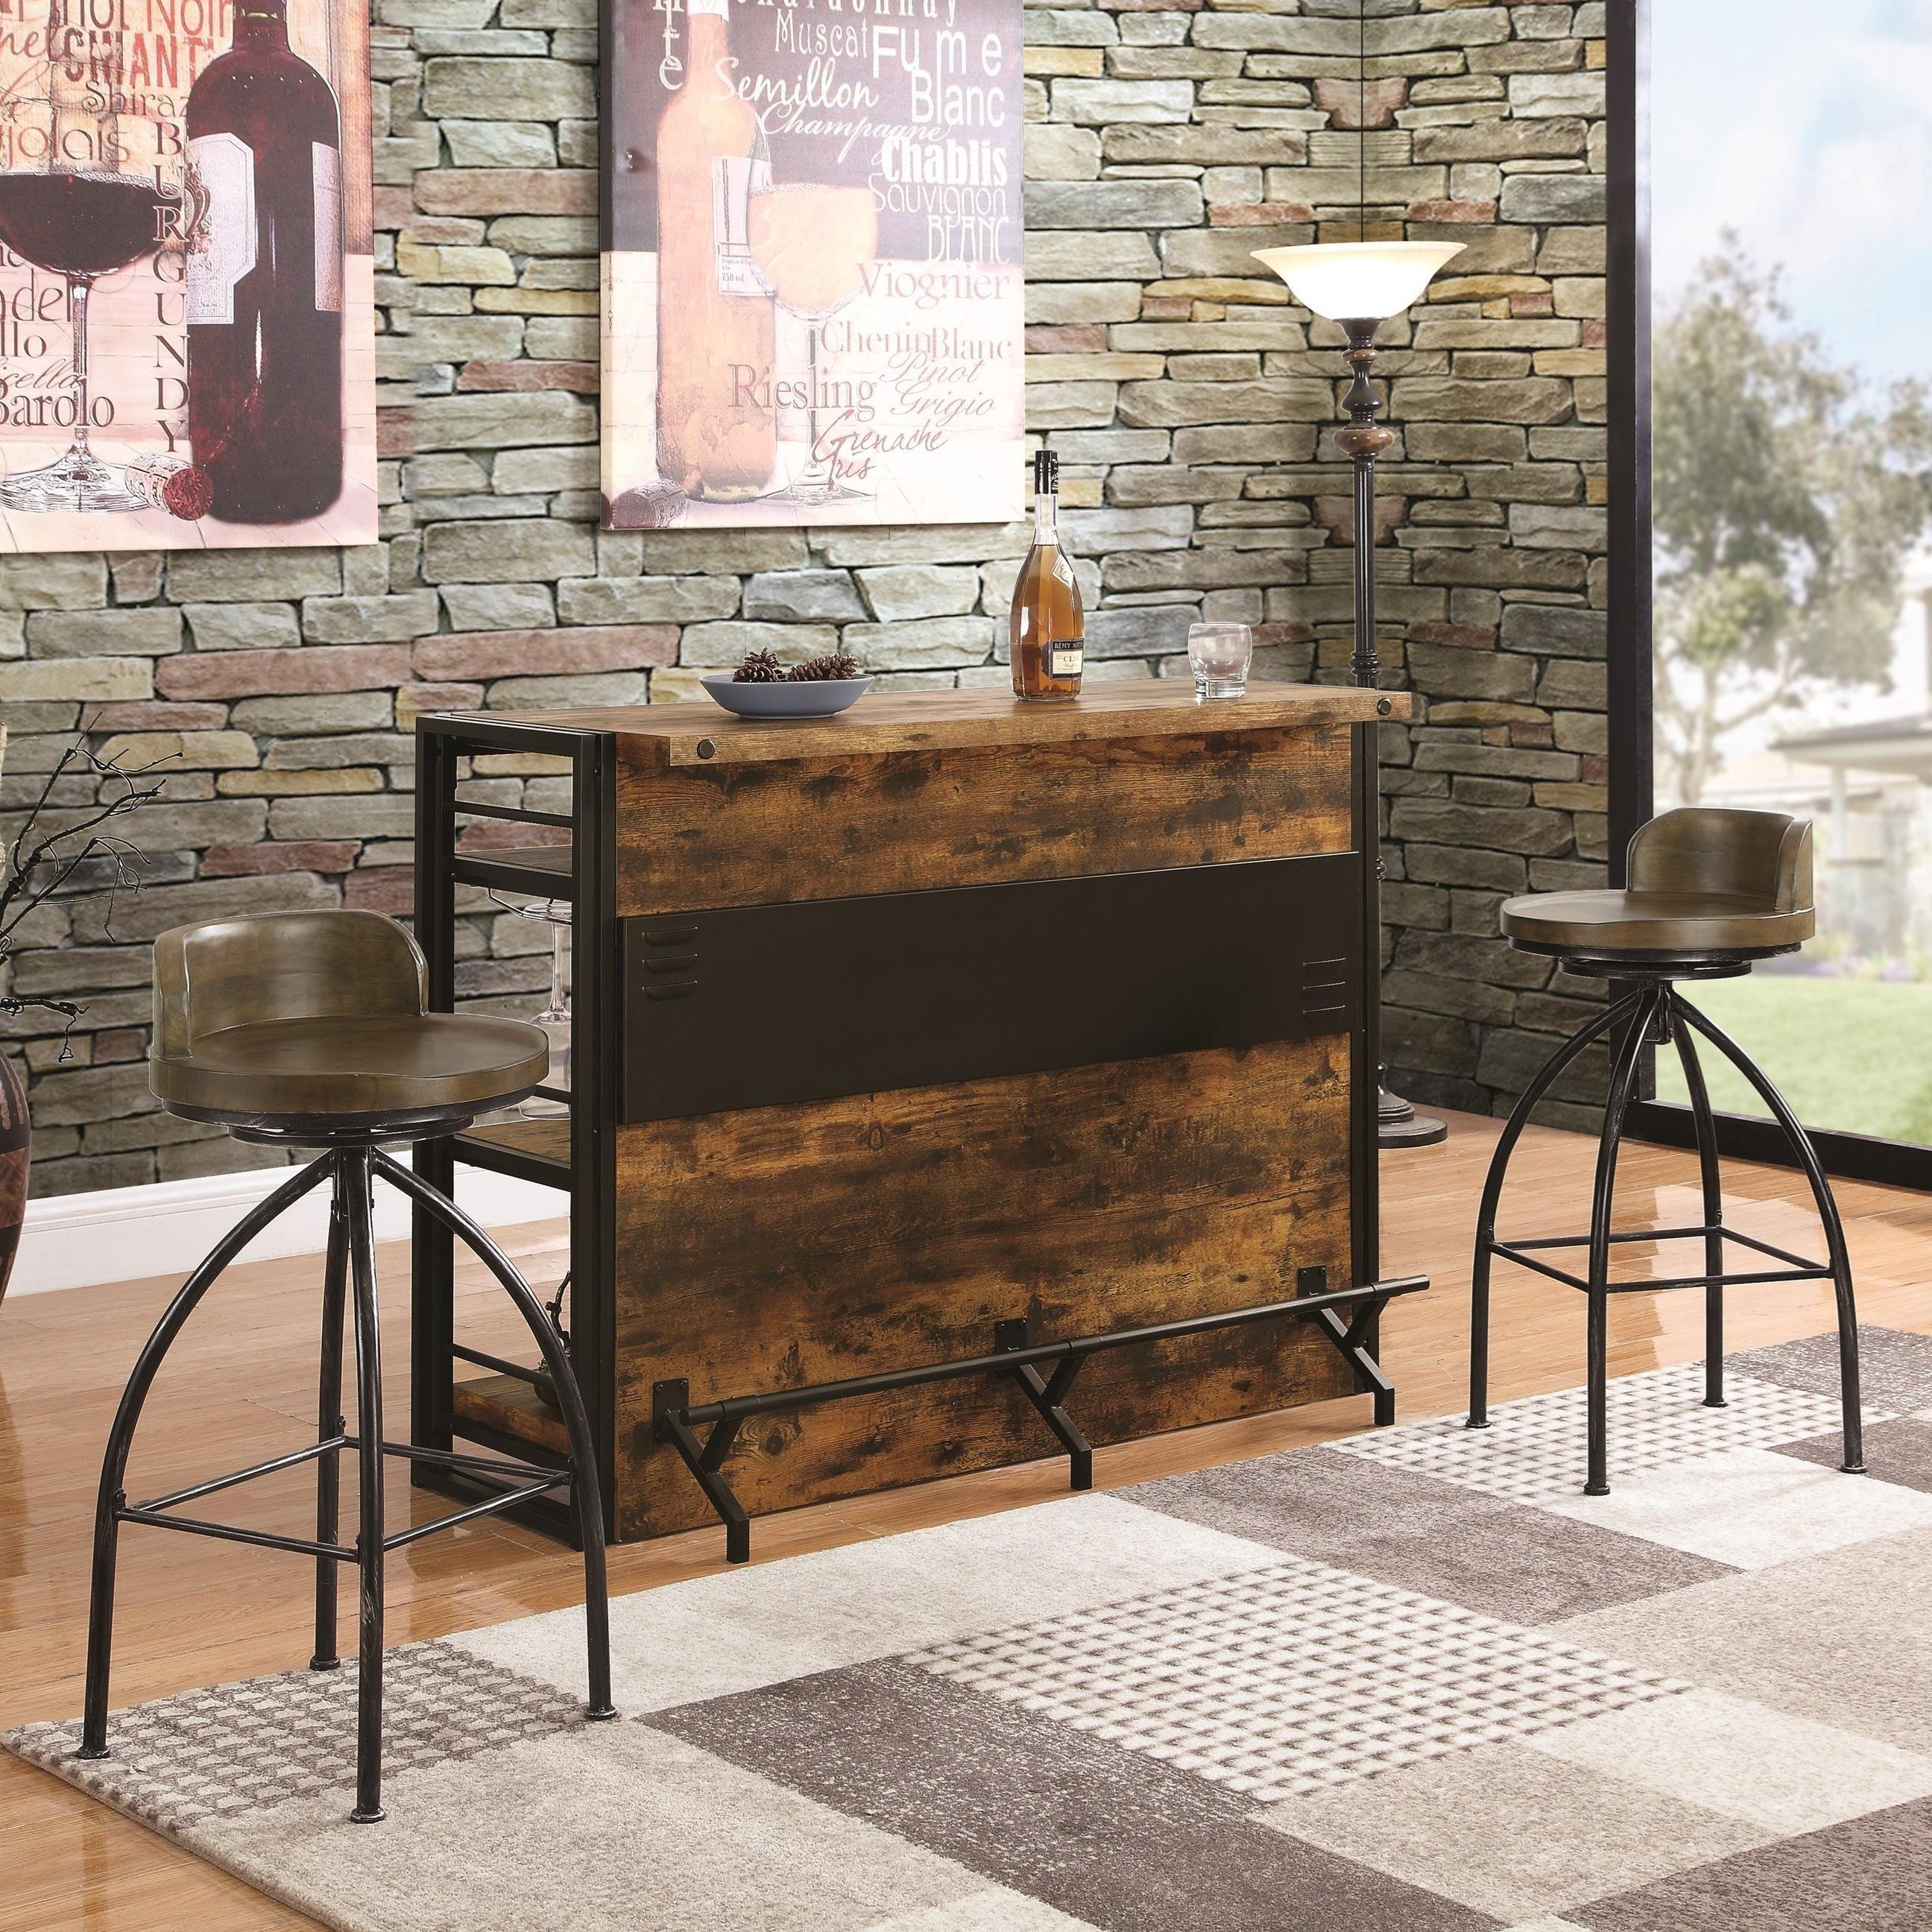 Bar Units and Bar Tables Bar and Stool Set by Coaster at Lapeer Furniture & Mattress Center